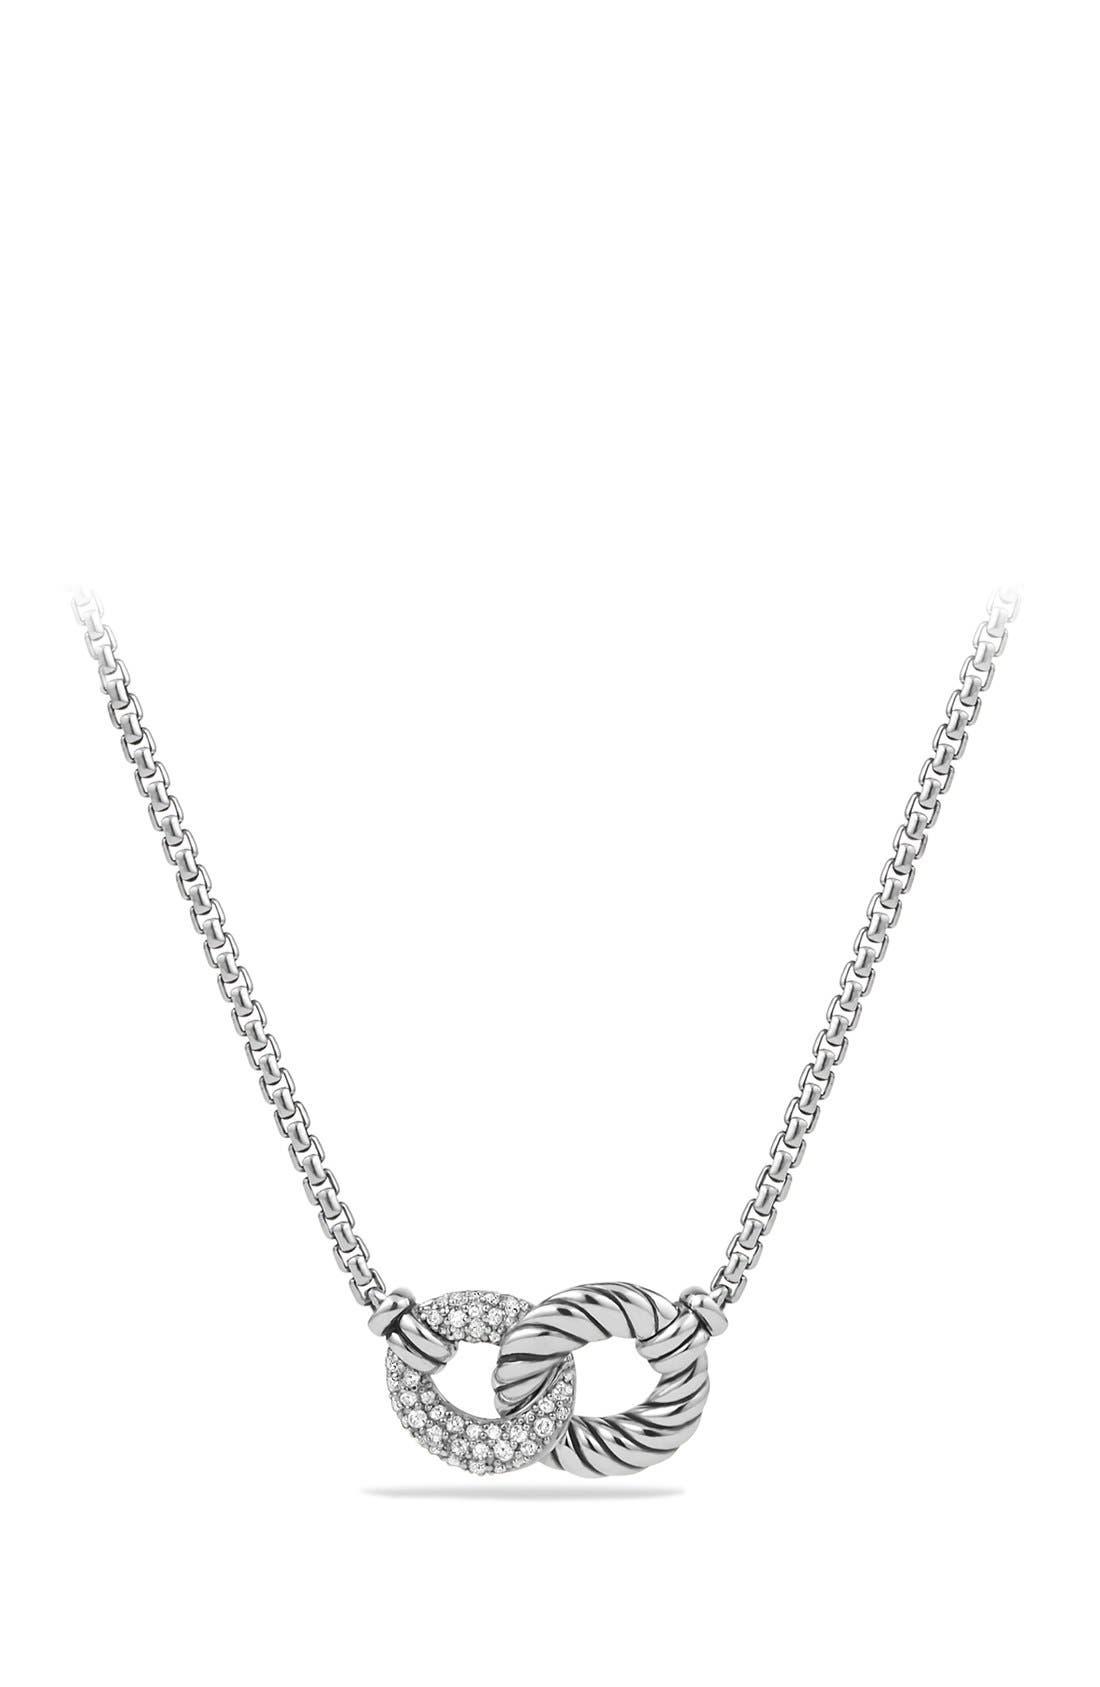 'Belmont' Necklace with Diamonds,                         Main,                         color, DIAMOND